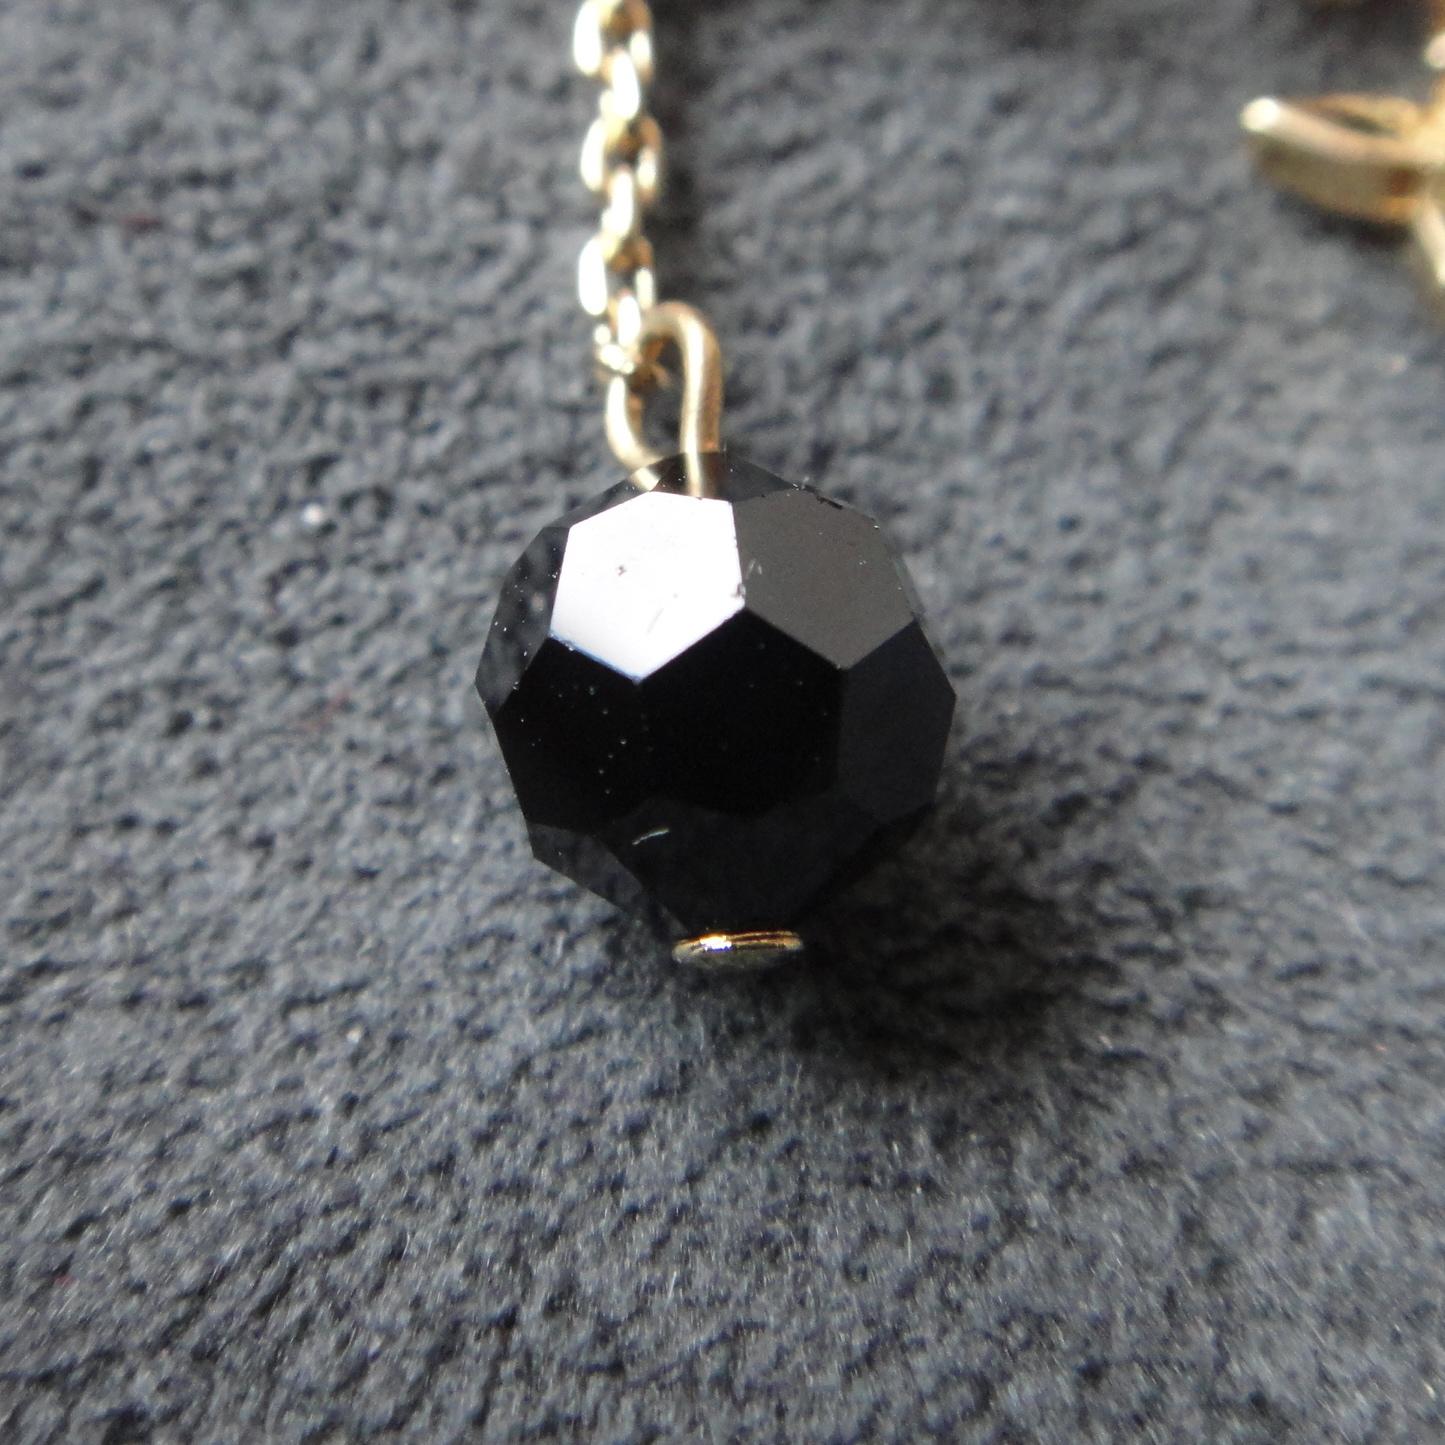 Louis Vuitton faceted black pearl